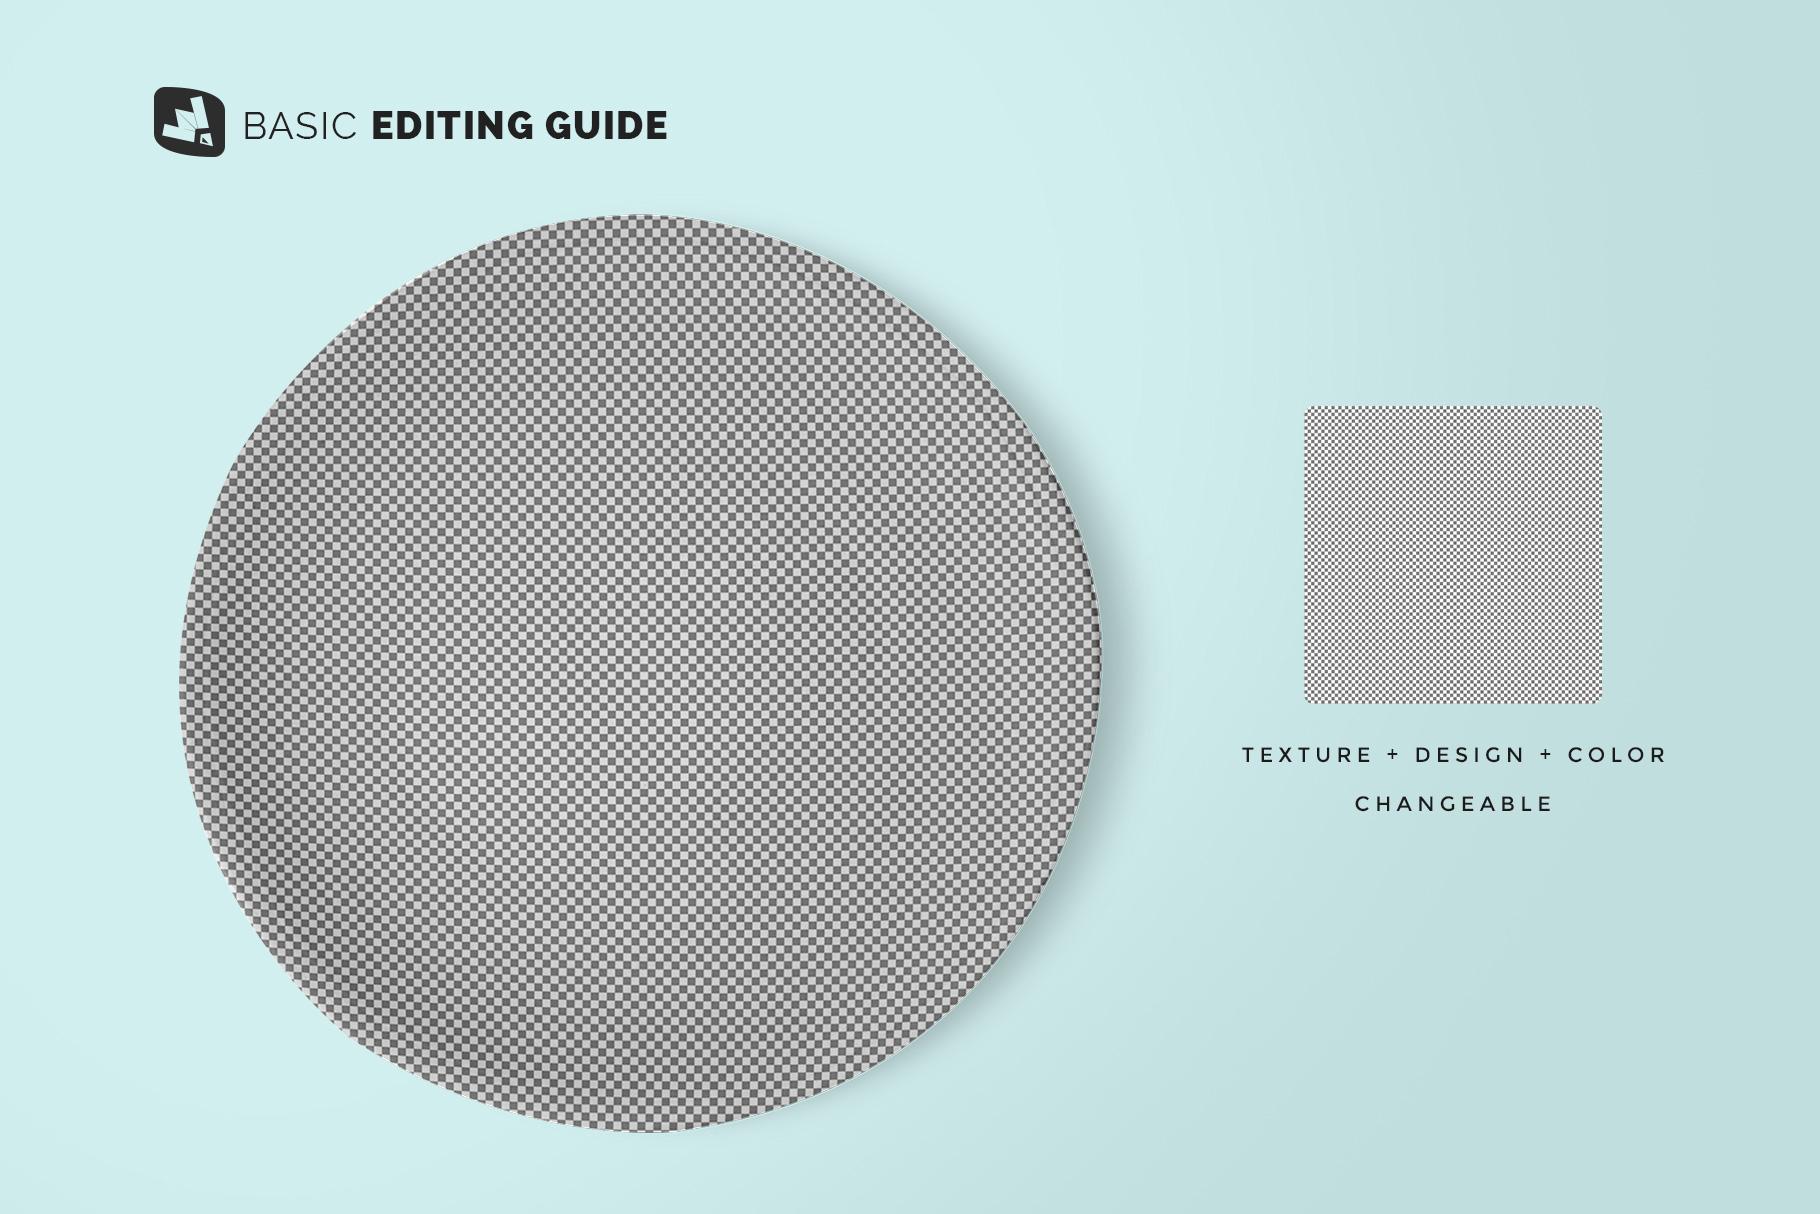 editability of the top view ceramic dish mockup